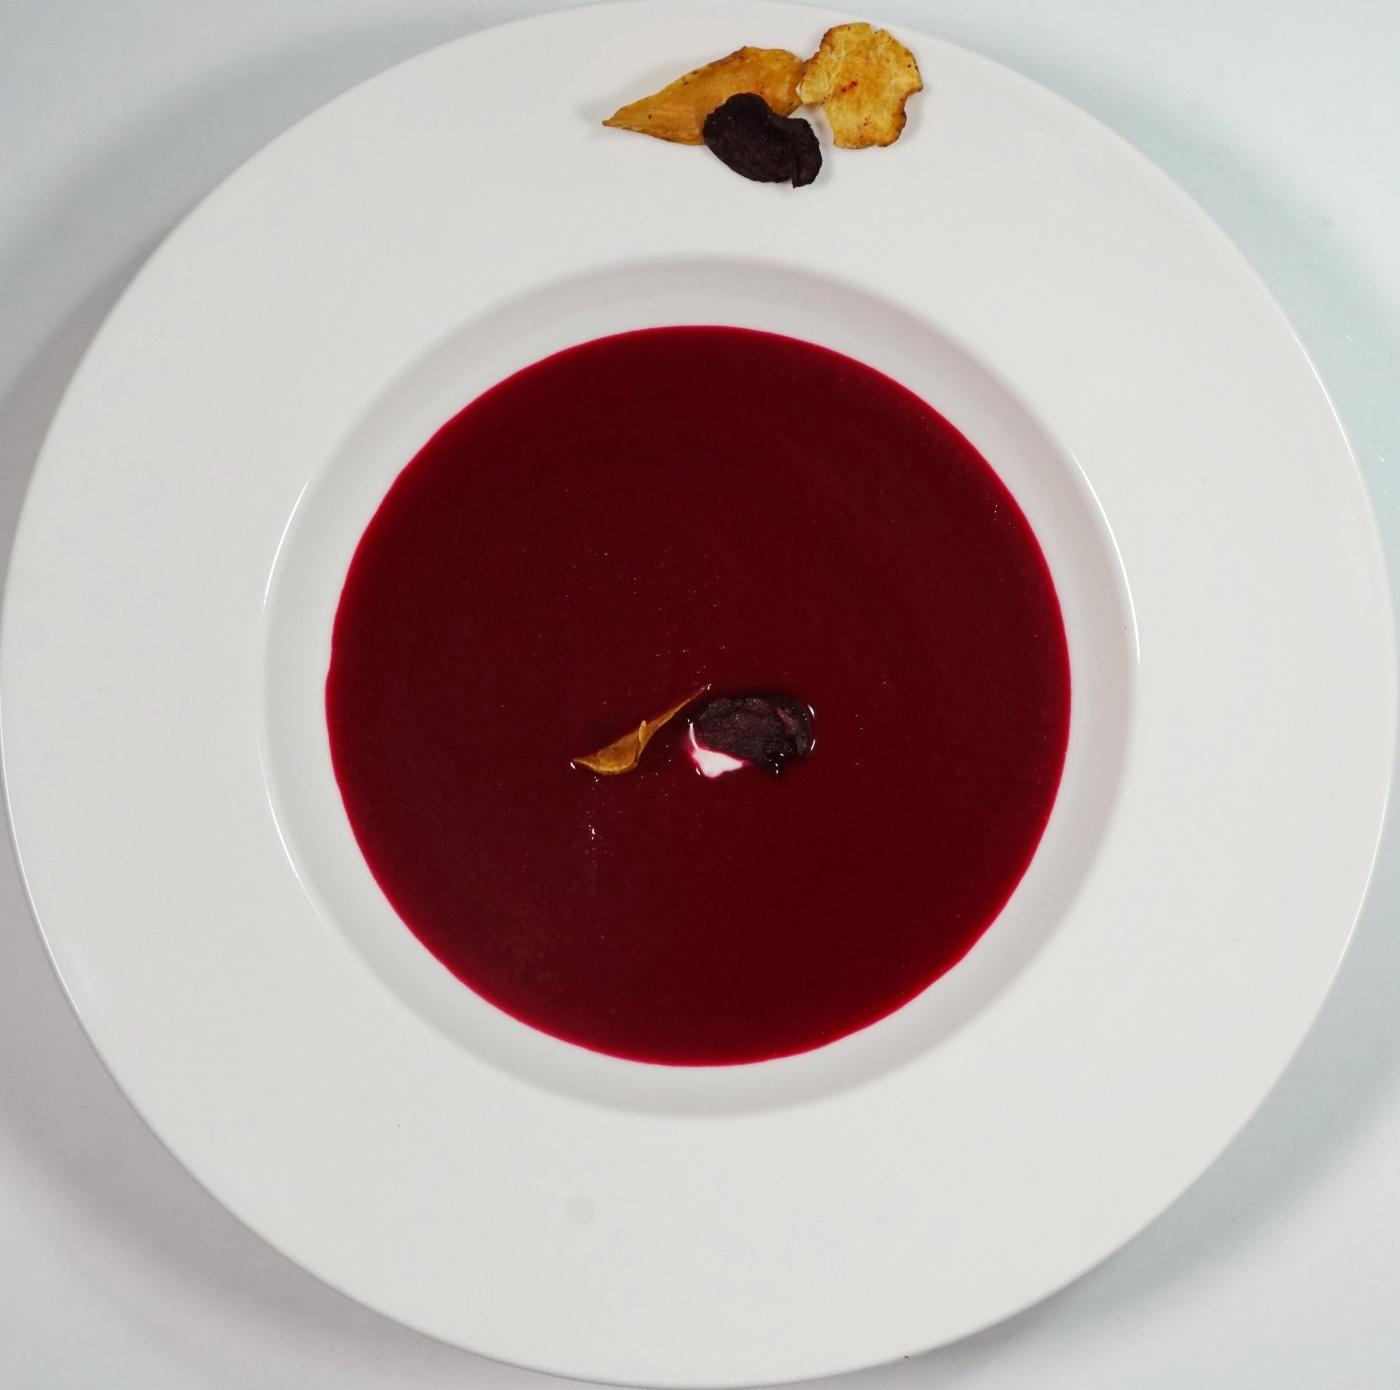 rote-bete-suppe-martin-deeken-dsc07344a